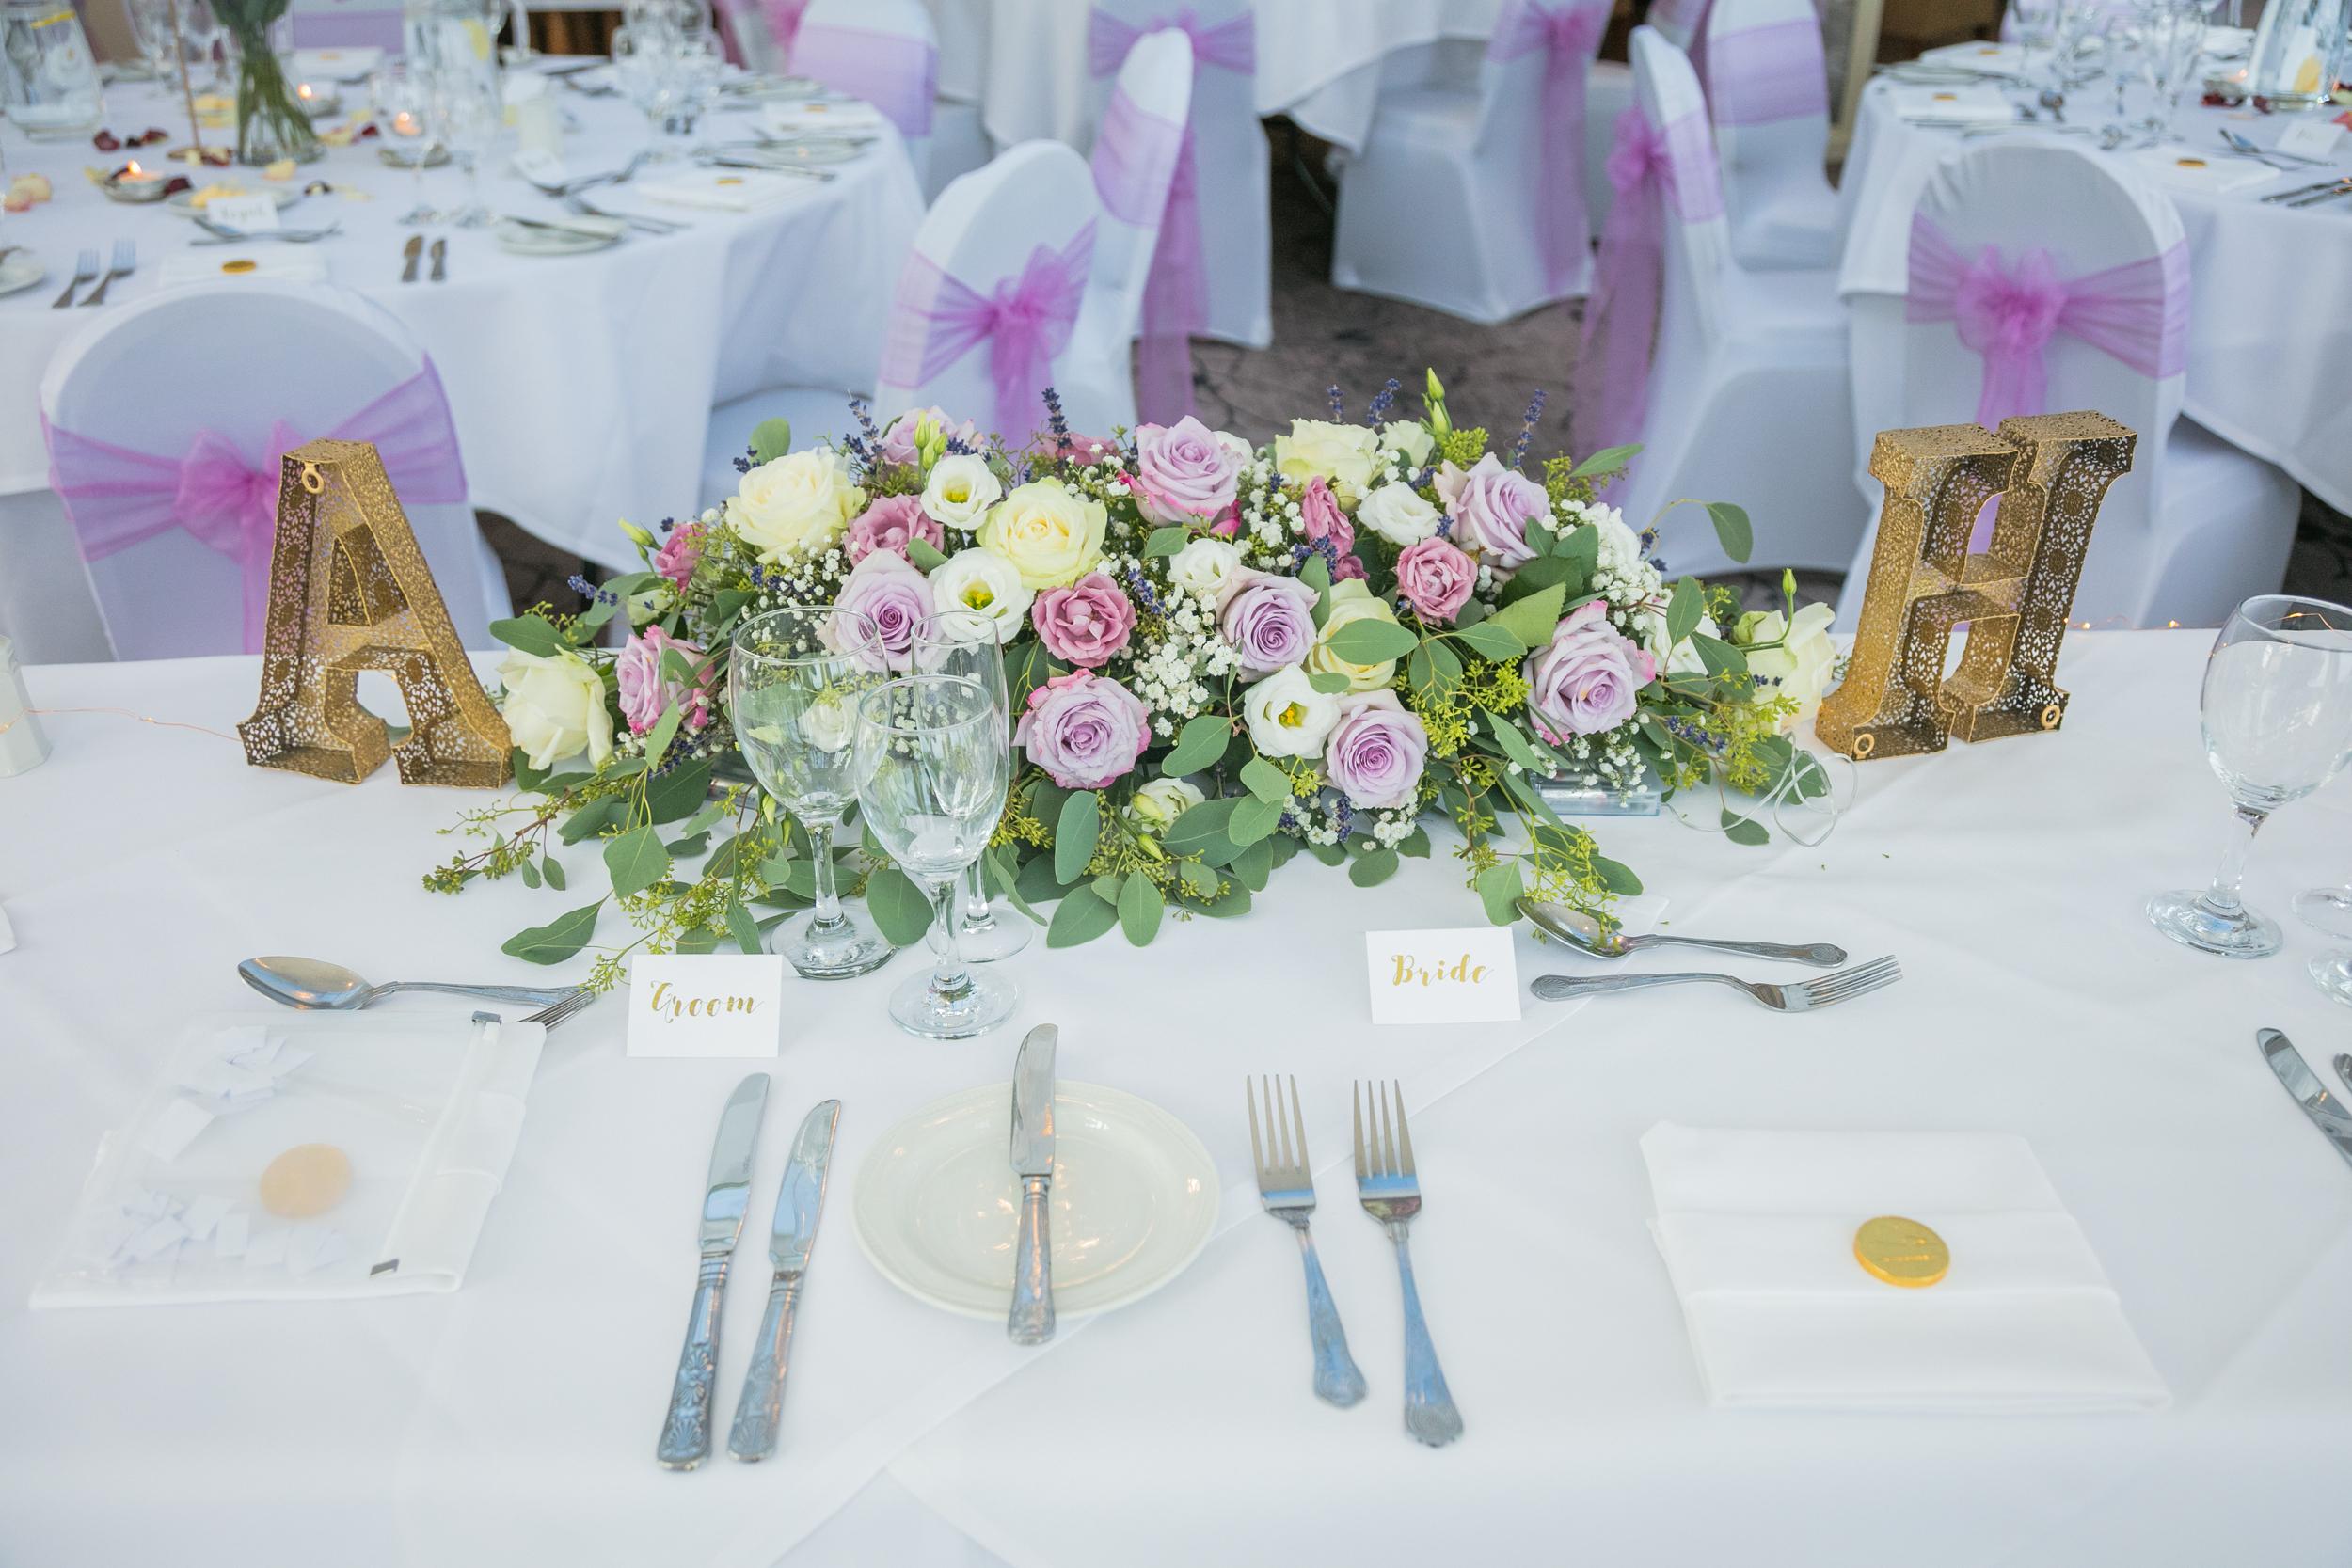 Charringworth-Manor-Wedding-Photography32.jpg